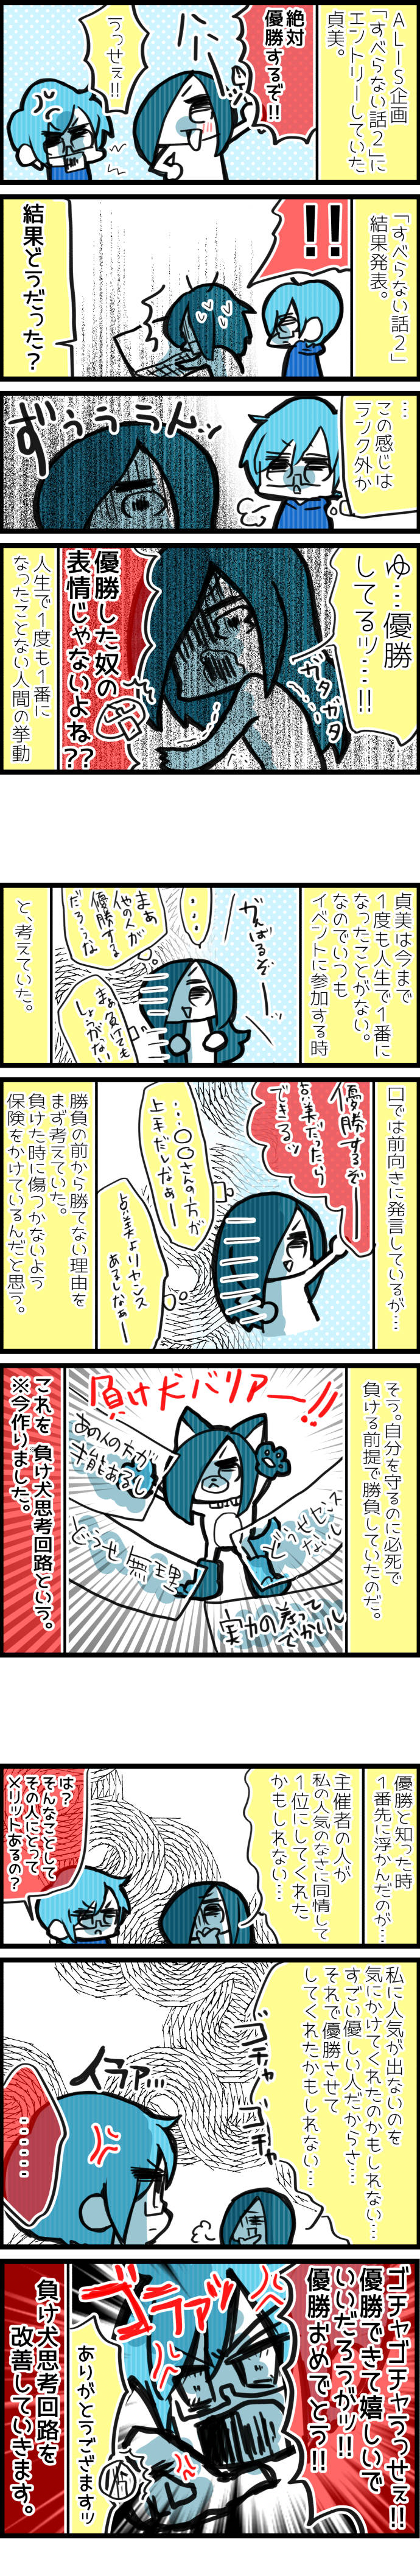 neetsadami.com_4コマ